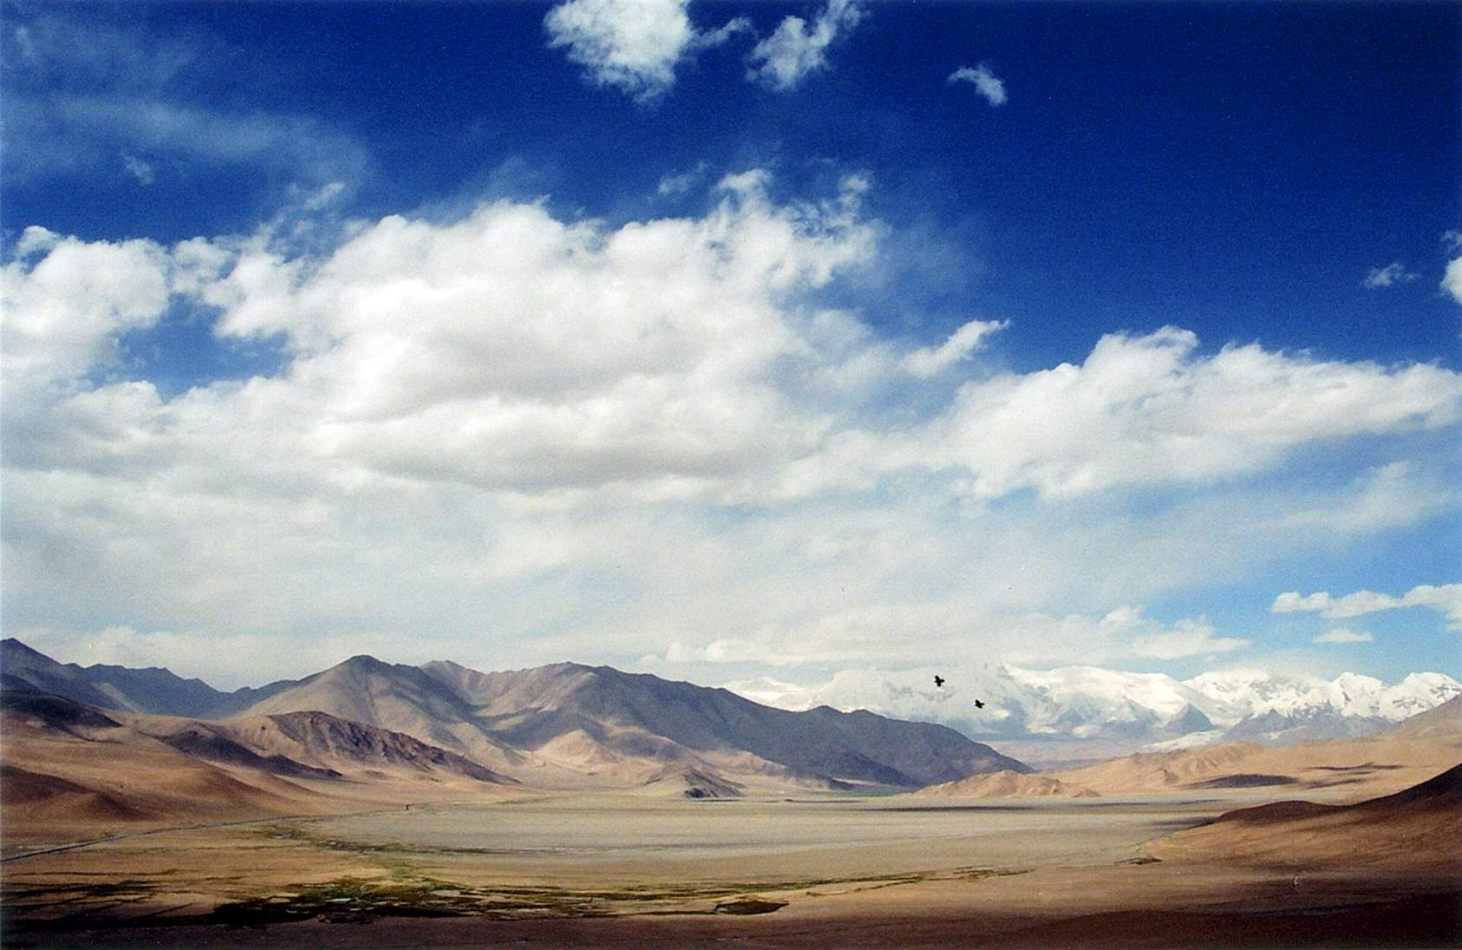 Anthony Ellis Photography: Tall Walls - Karakoram Plateau